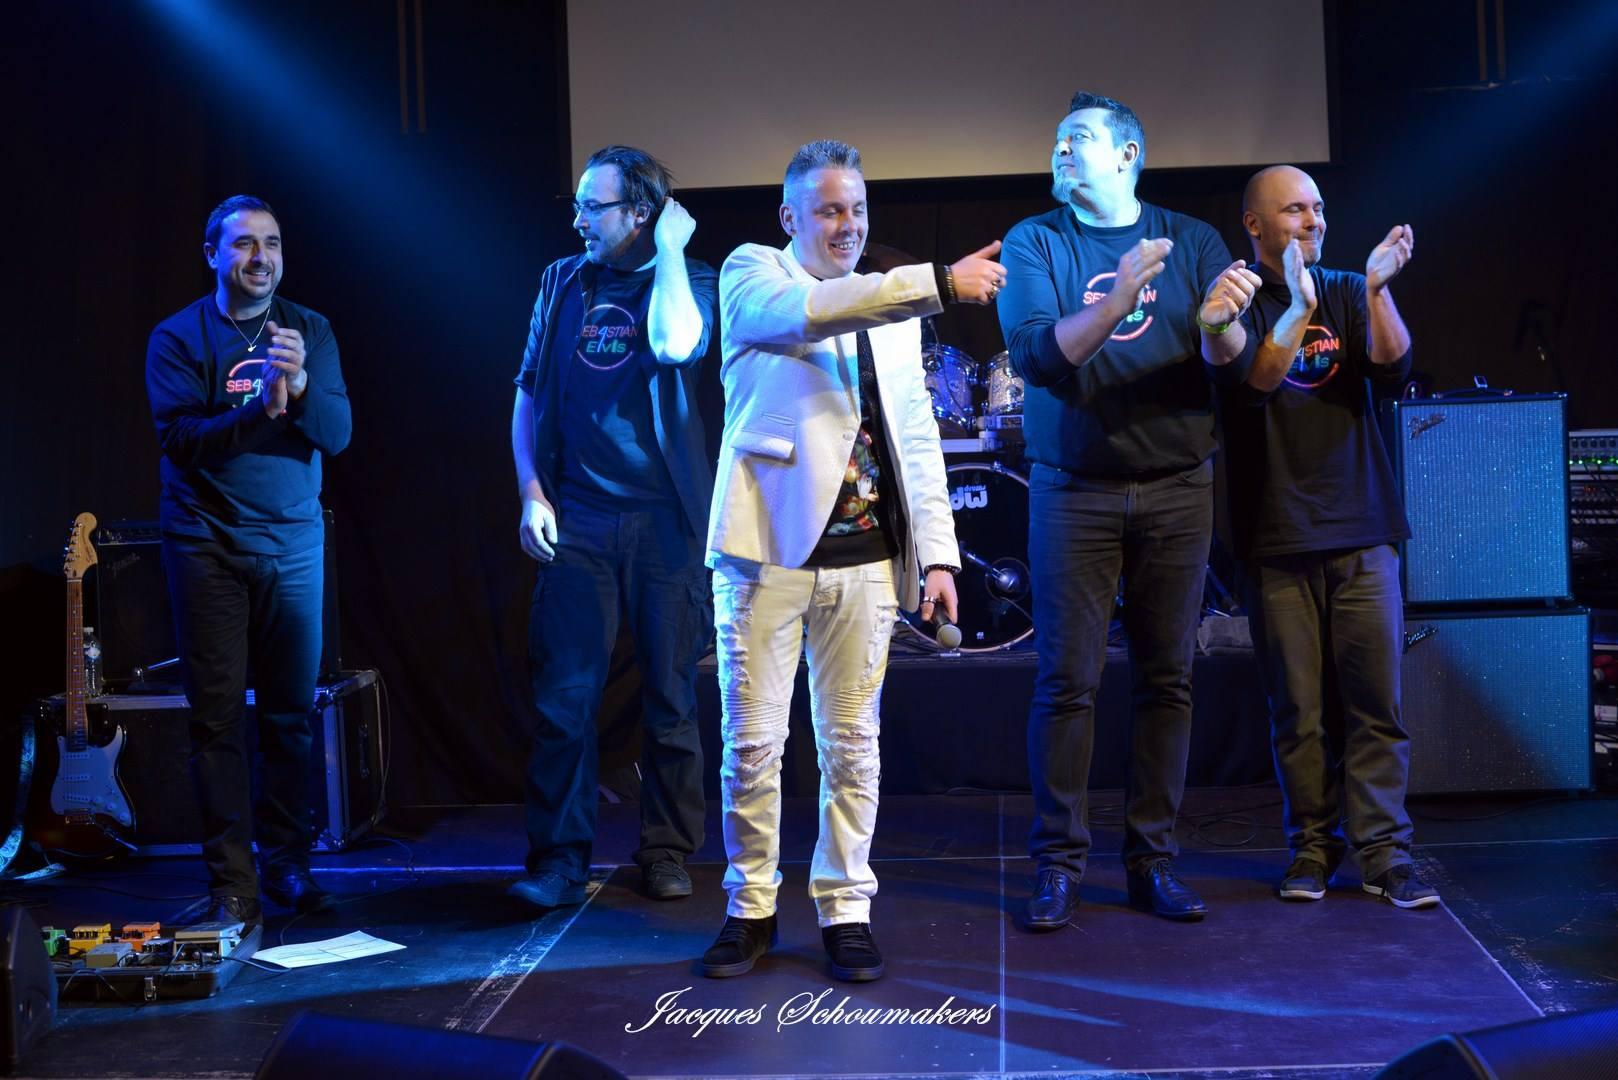 sebastian-for-elvis-casino-de-spa-happy-birthday-elvis-facebook-603